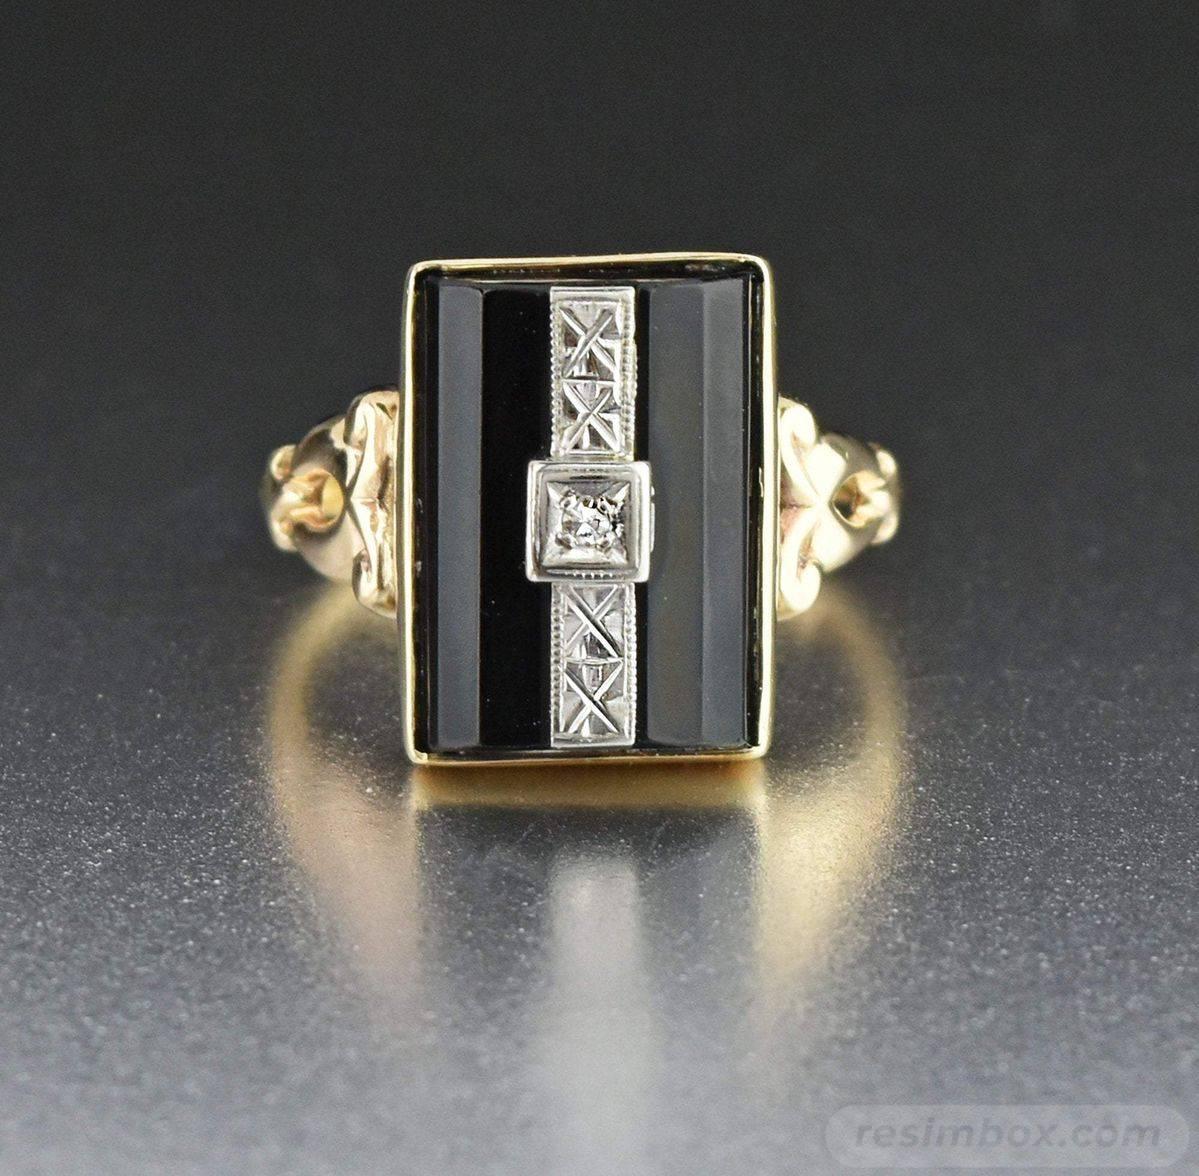 Art deco jewelry-167196204902652772